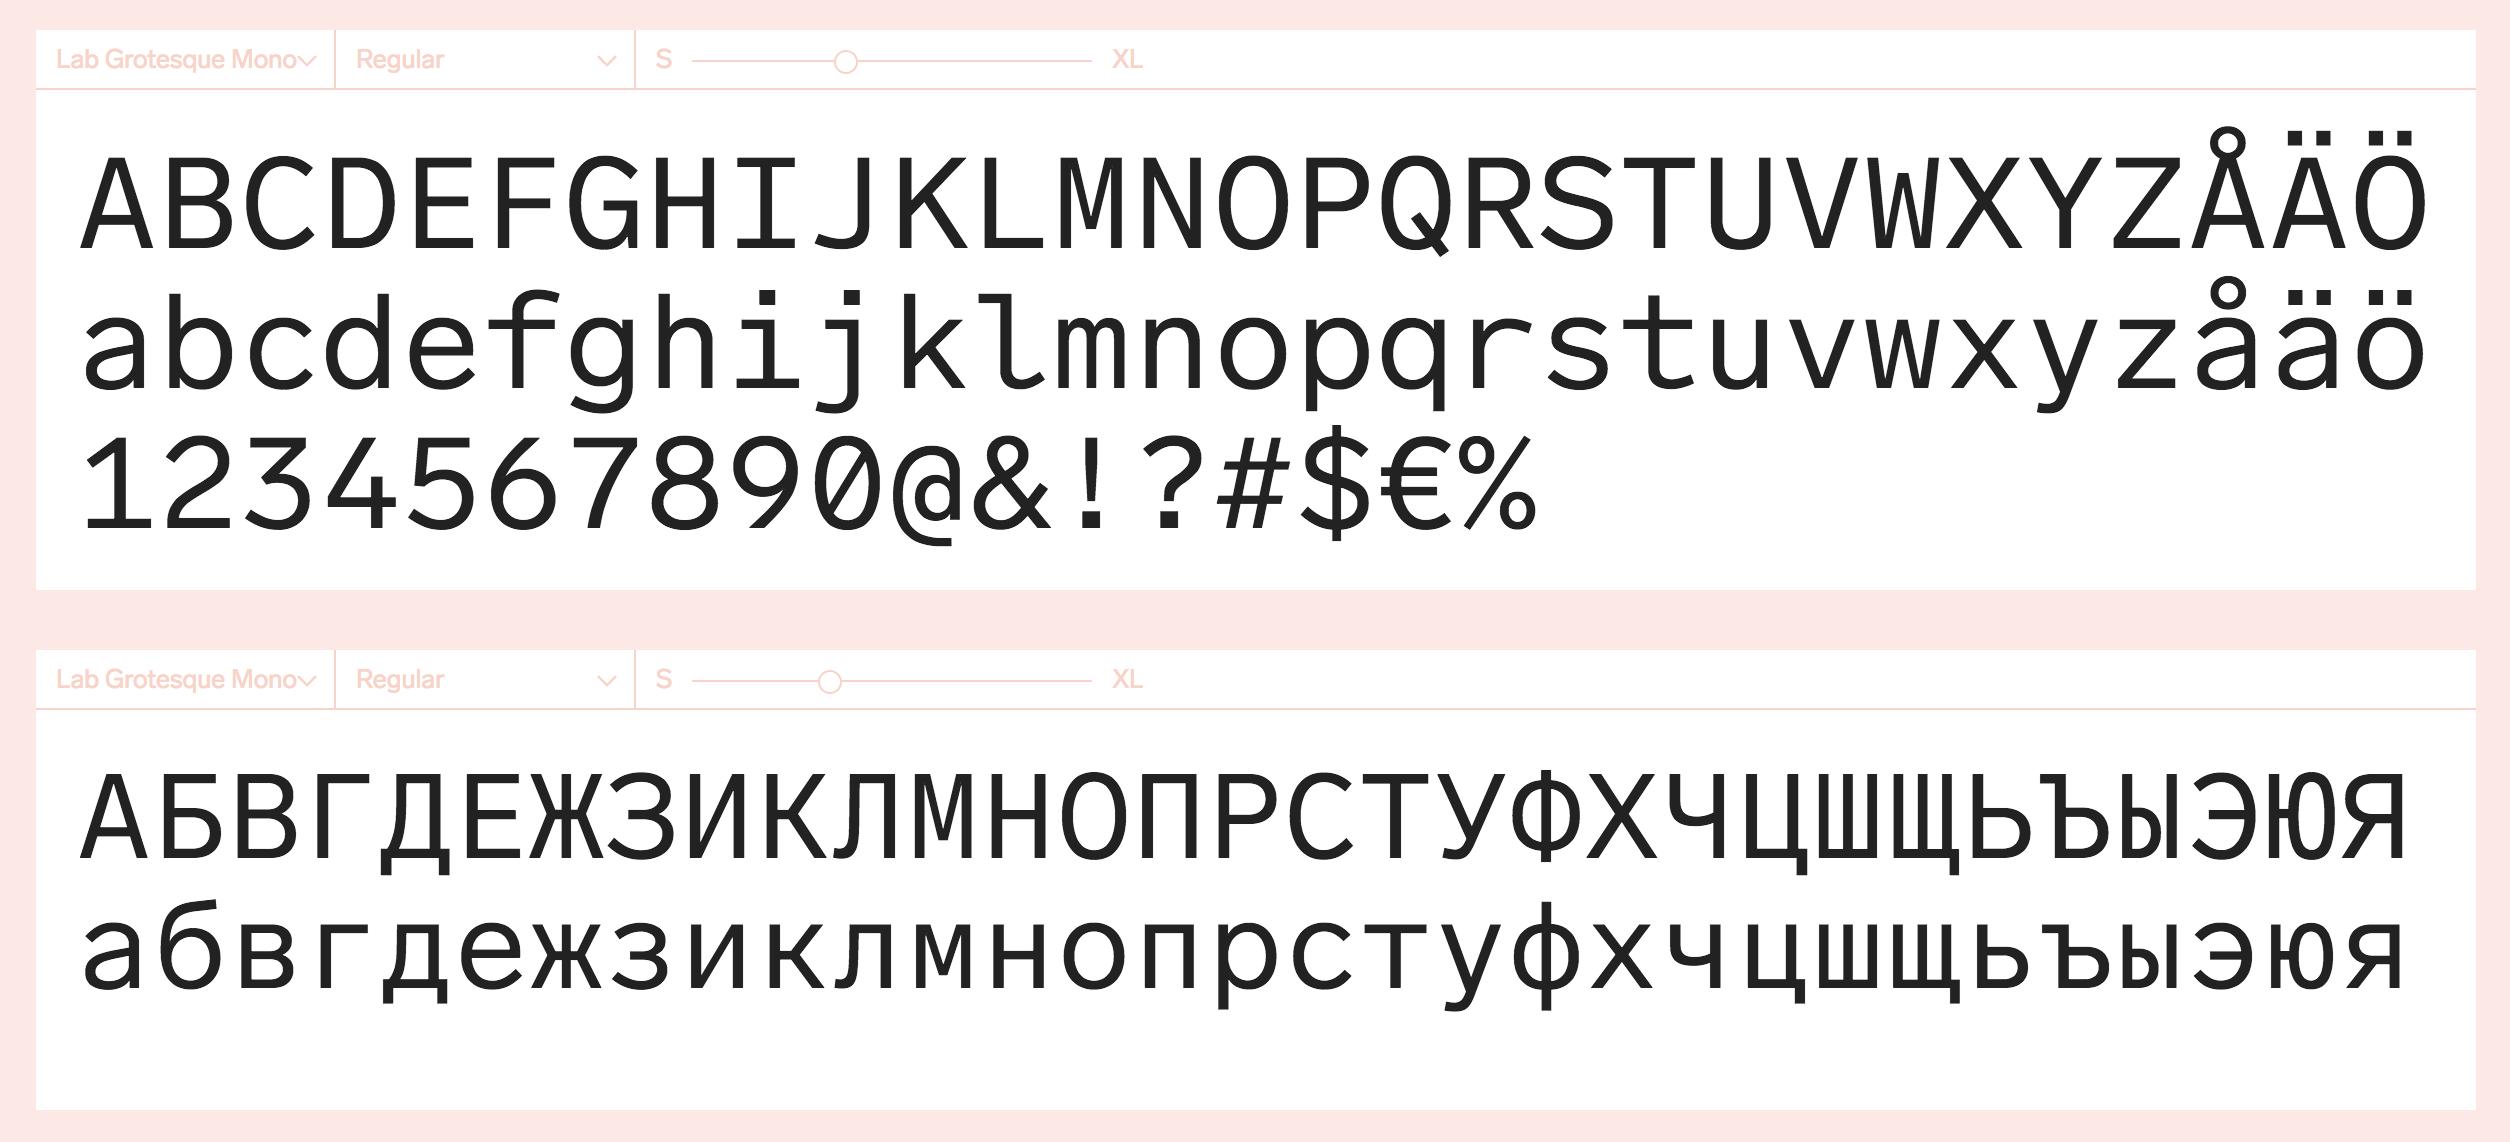 9 / Cyrillic swashes goodness | Revue